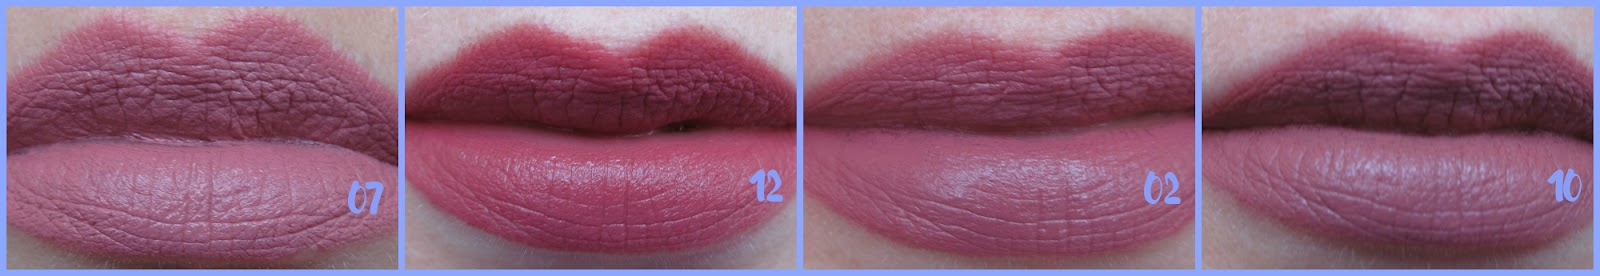 Як матові помади Velvet Matte та Matte Lipstick Crayon виглядають на губах